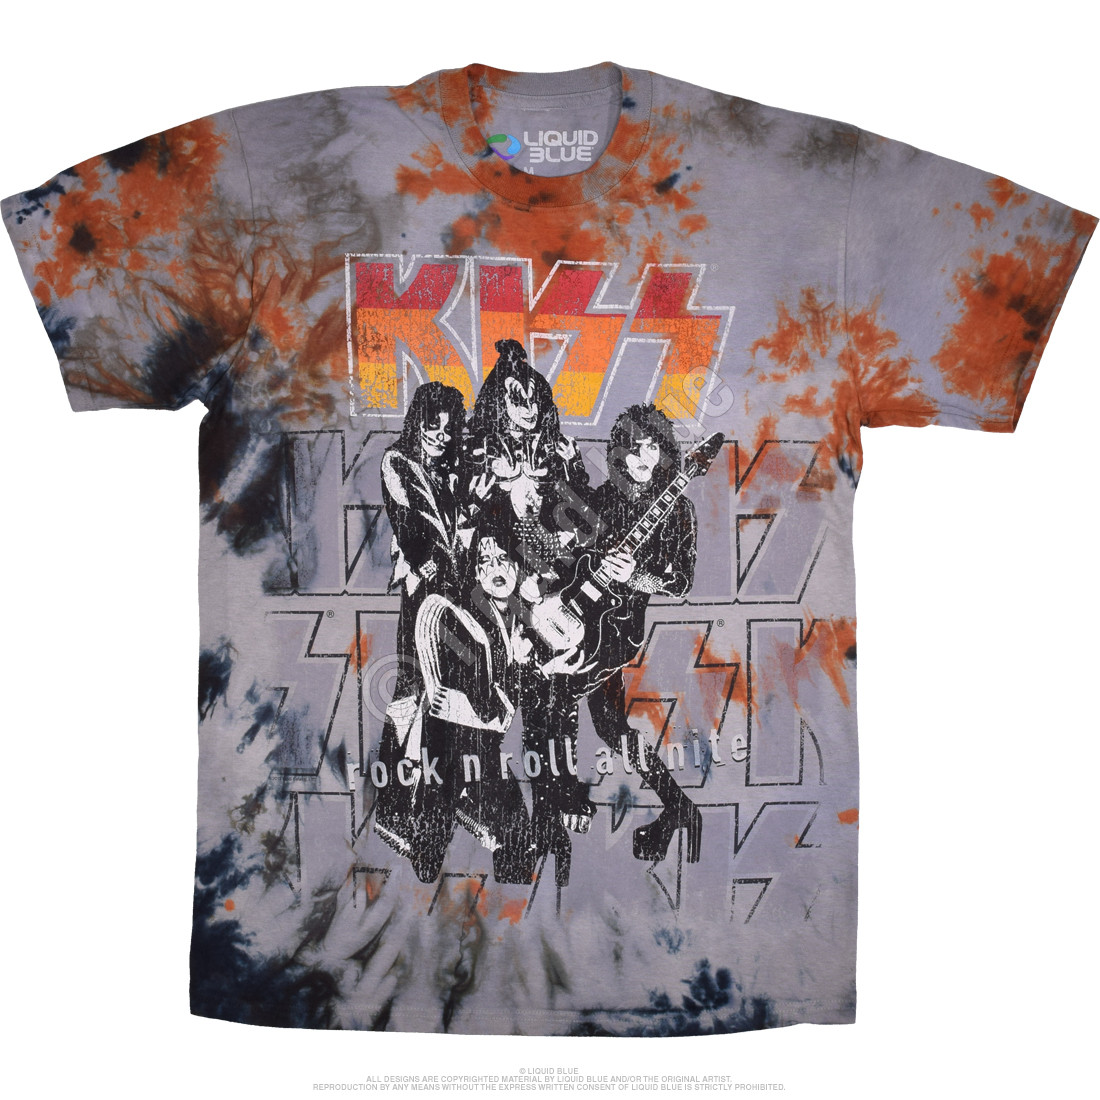 XL Kiss Road Crew 77 M L 2XL Tie Dye T-Shirt